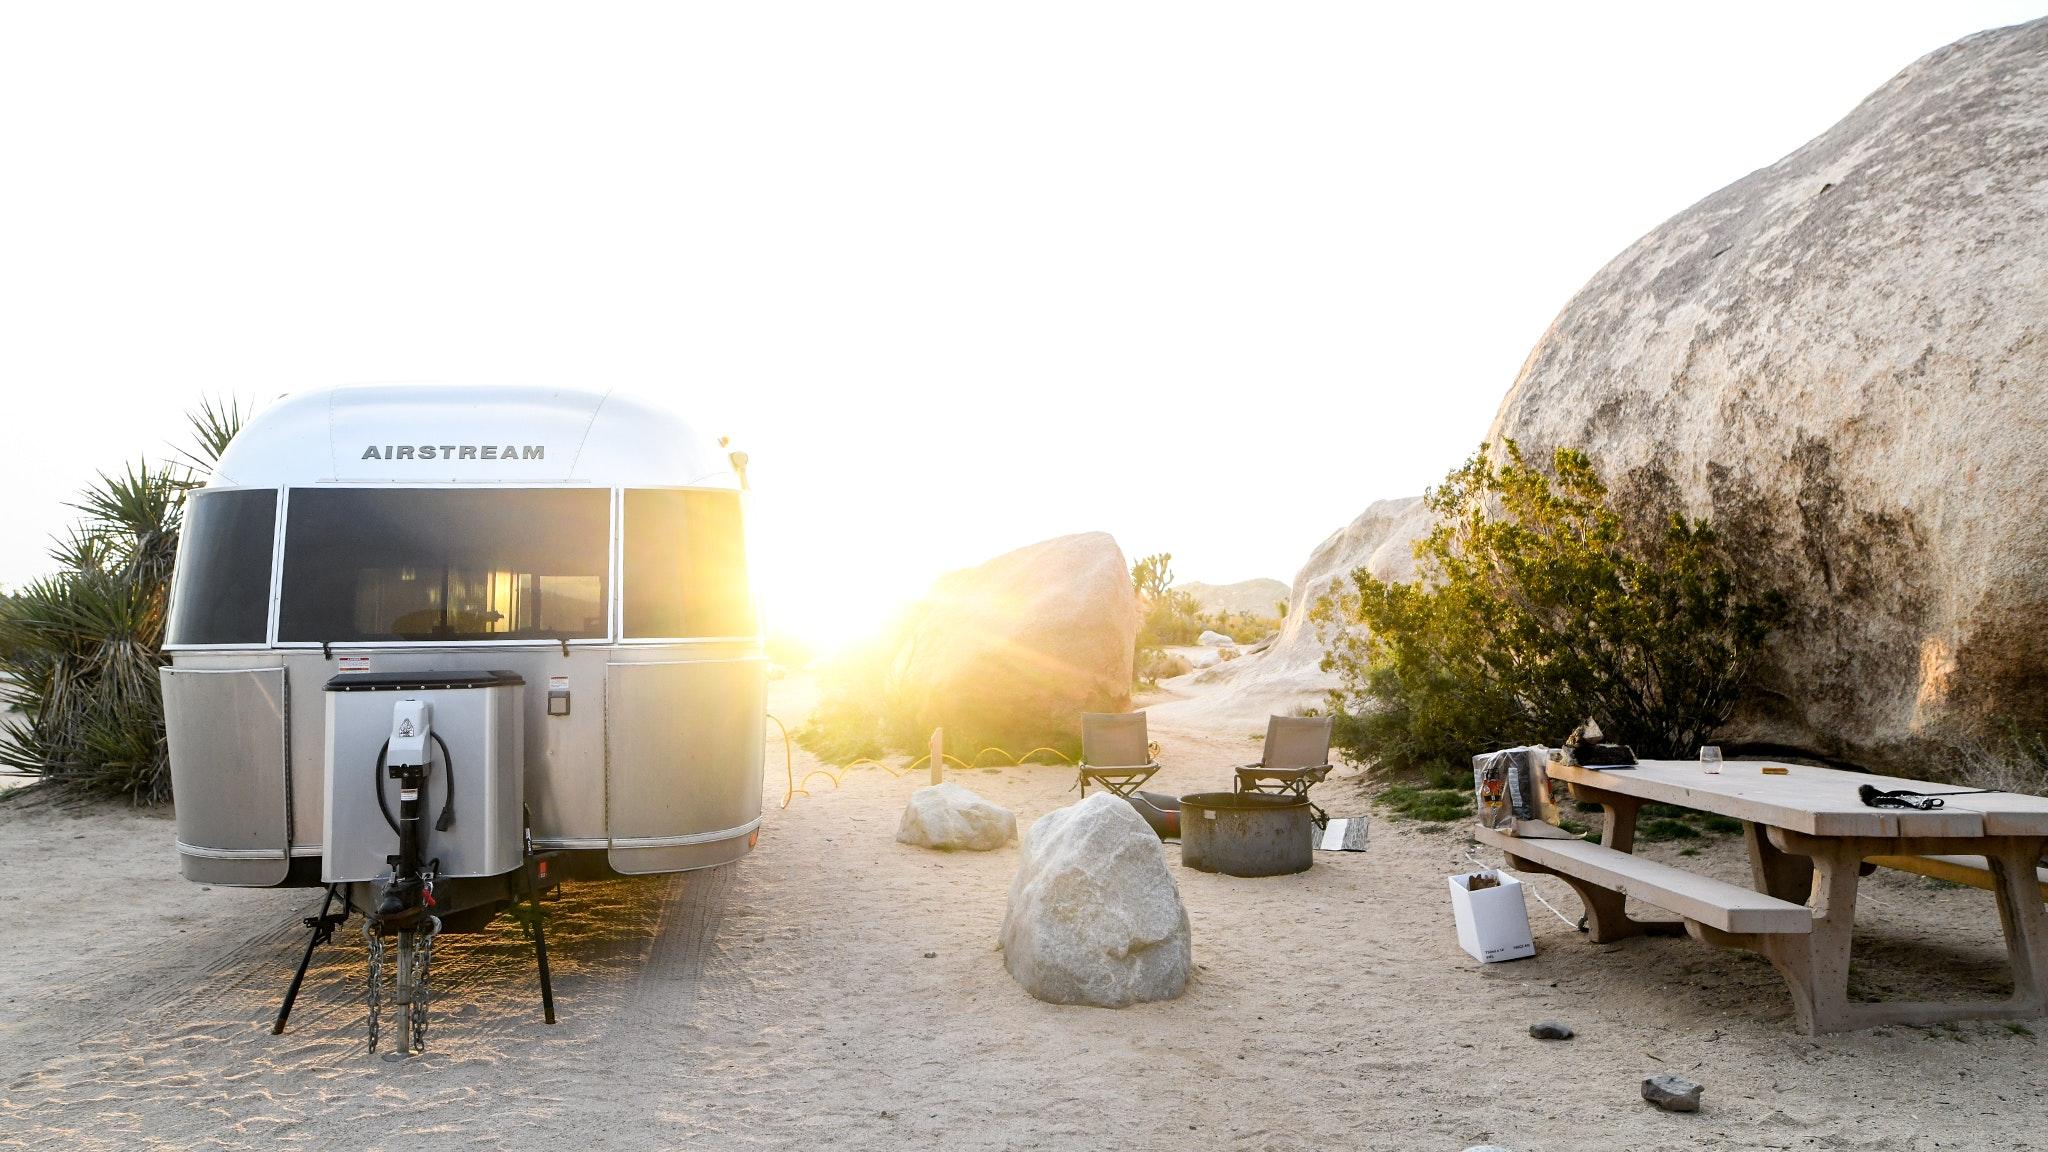 Airstream-National-Parks-Updates-2020-Feature-Joshua-Tree-Desktop-Header